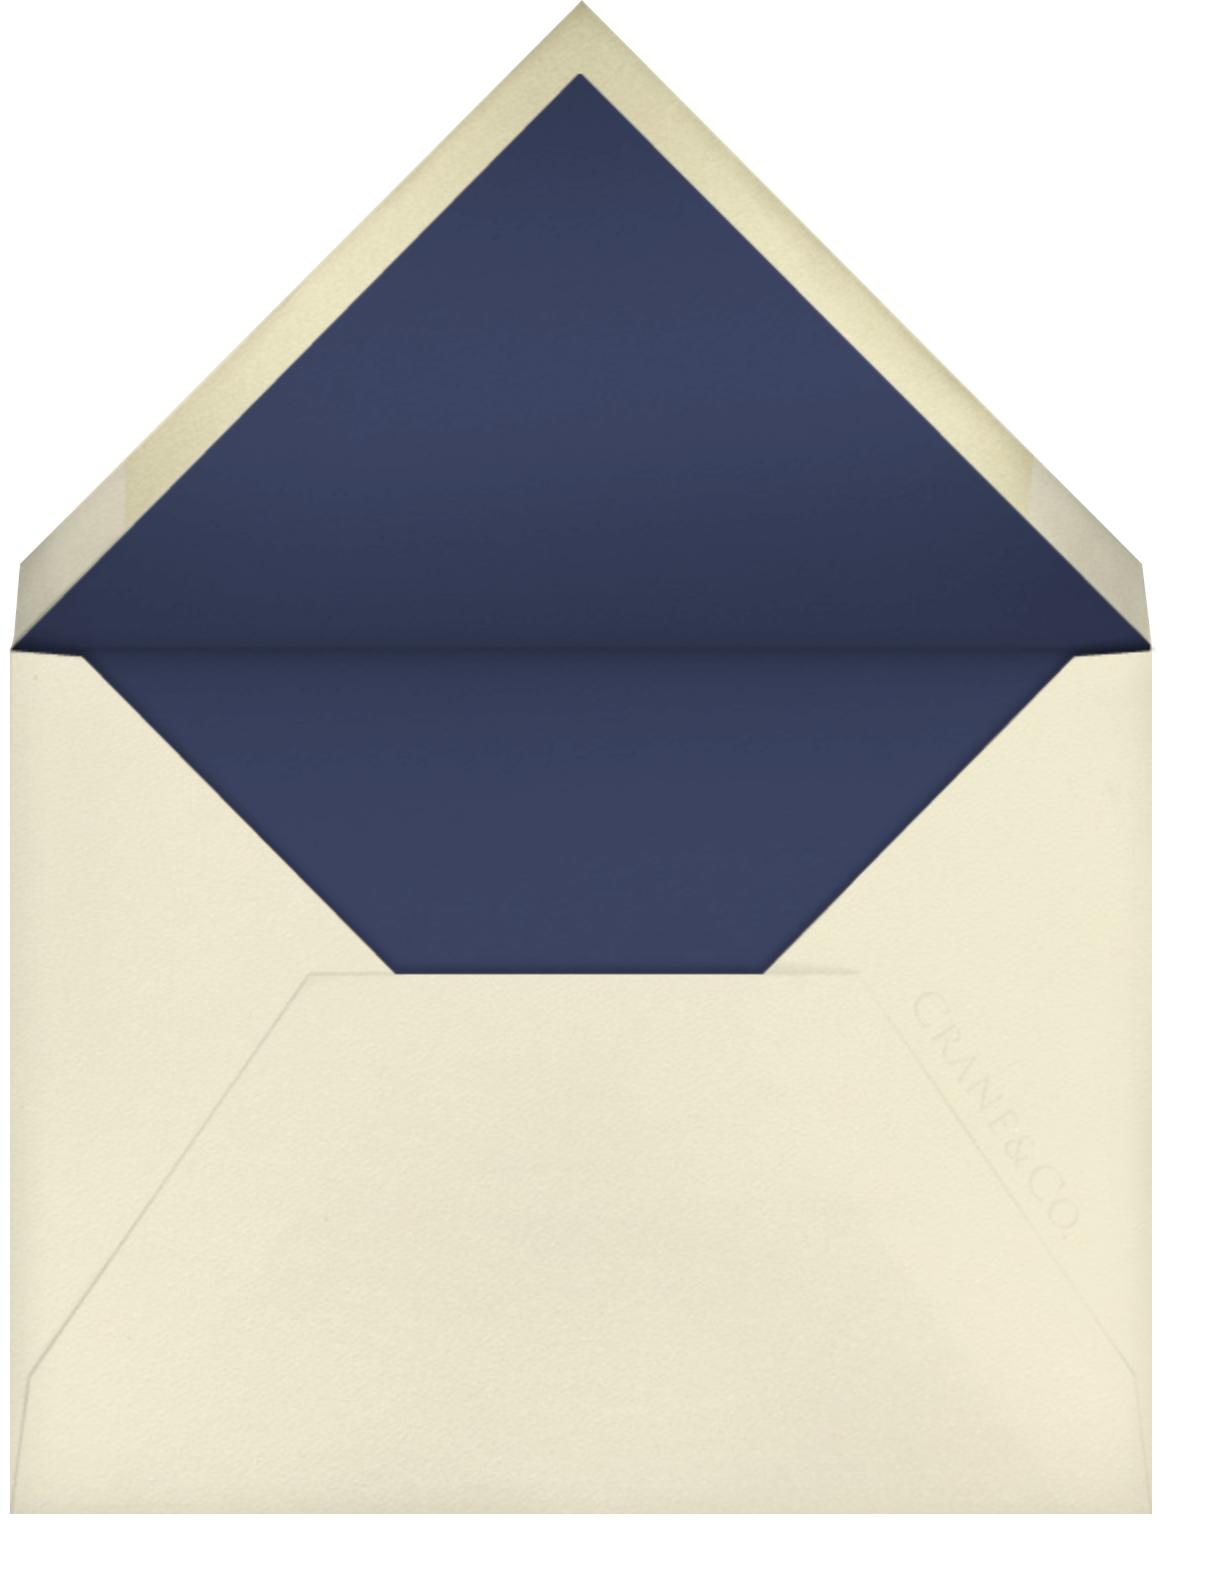 Nautical I (Save the Date) - kate spade new york - Destination - envelope back